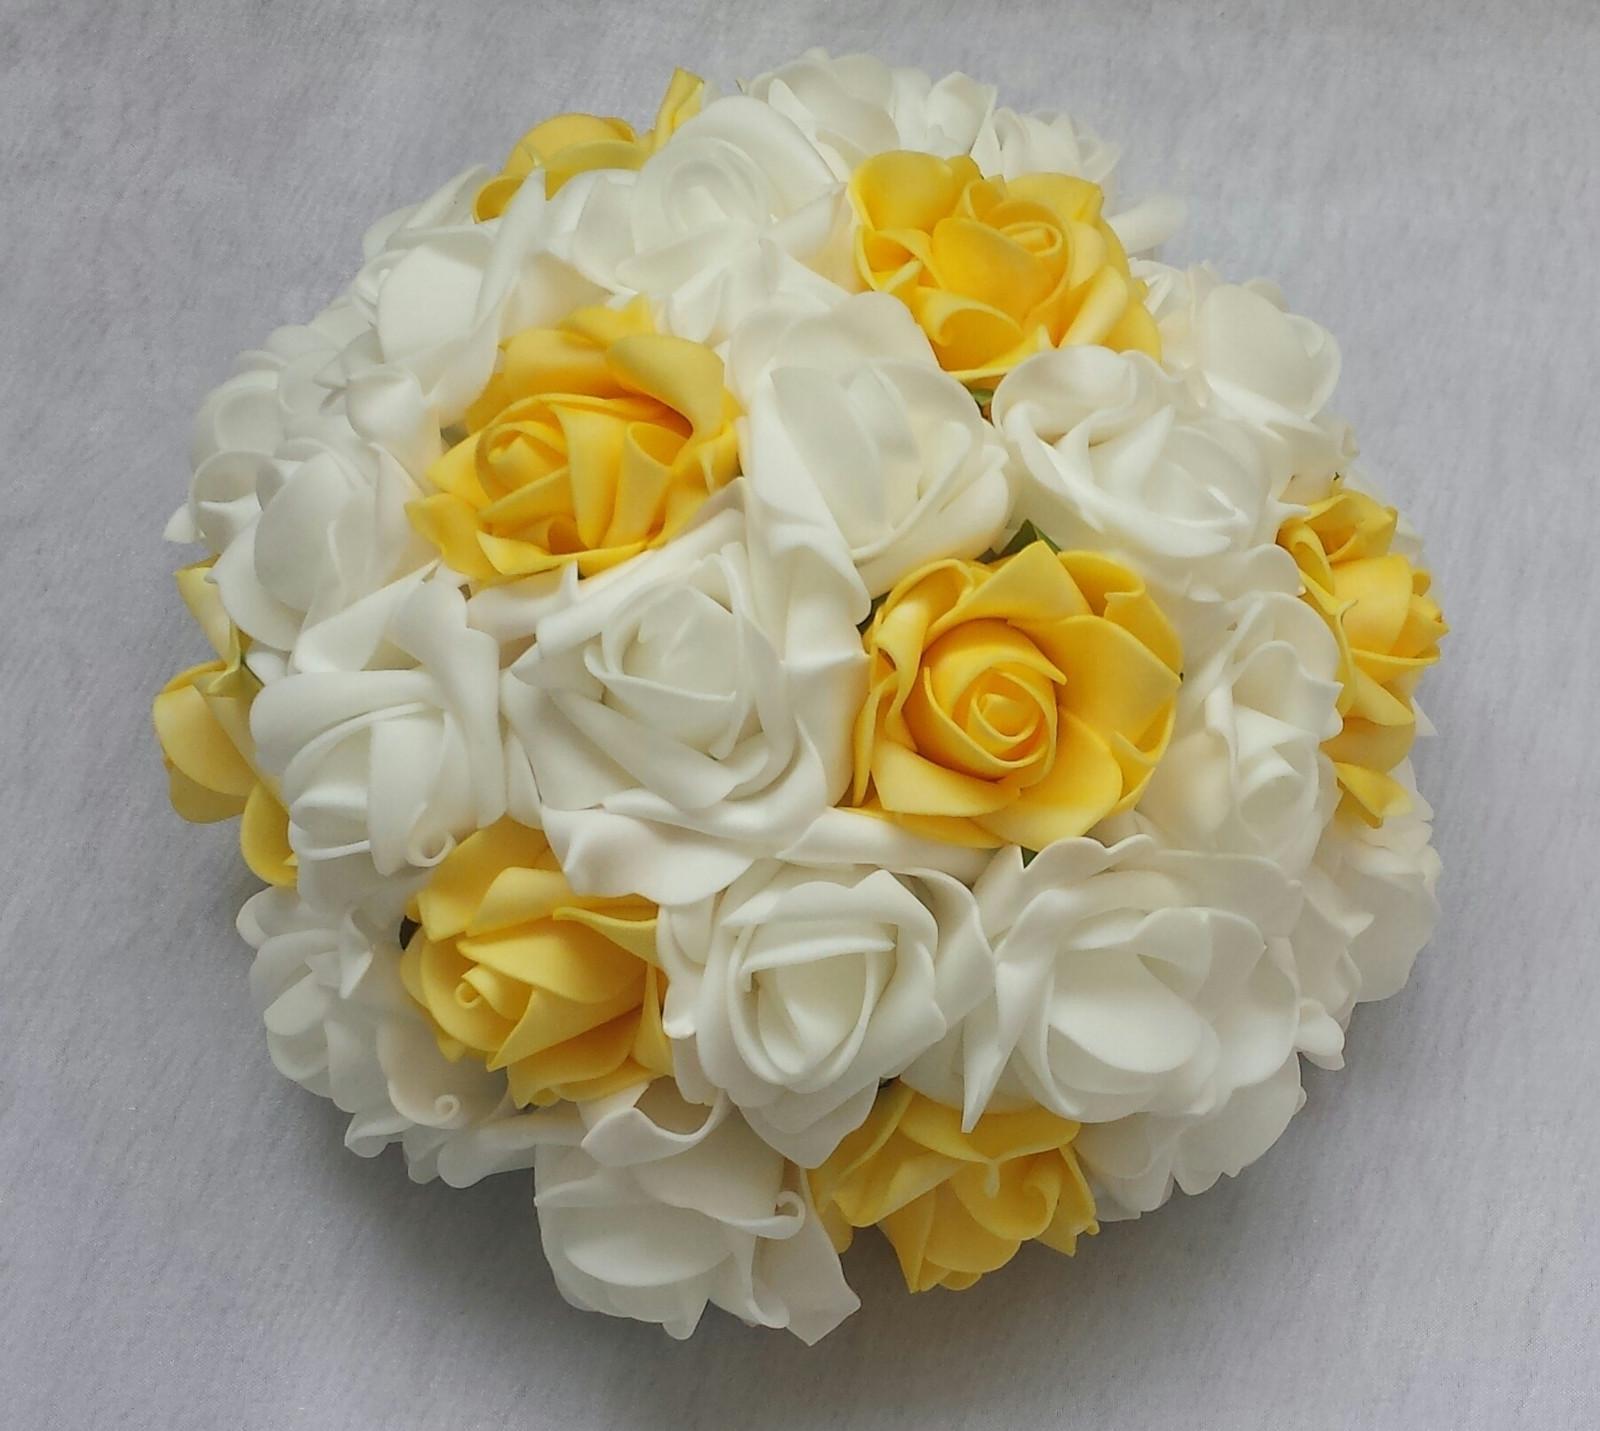 Buket na svatební auto bílá a žlutá - Obrázek č. 1